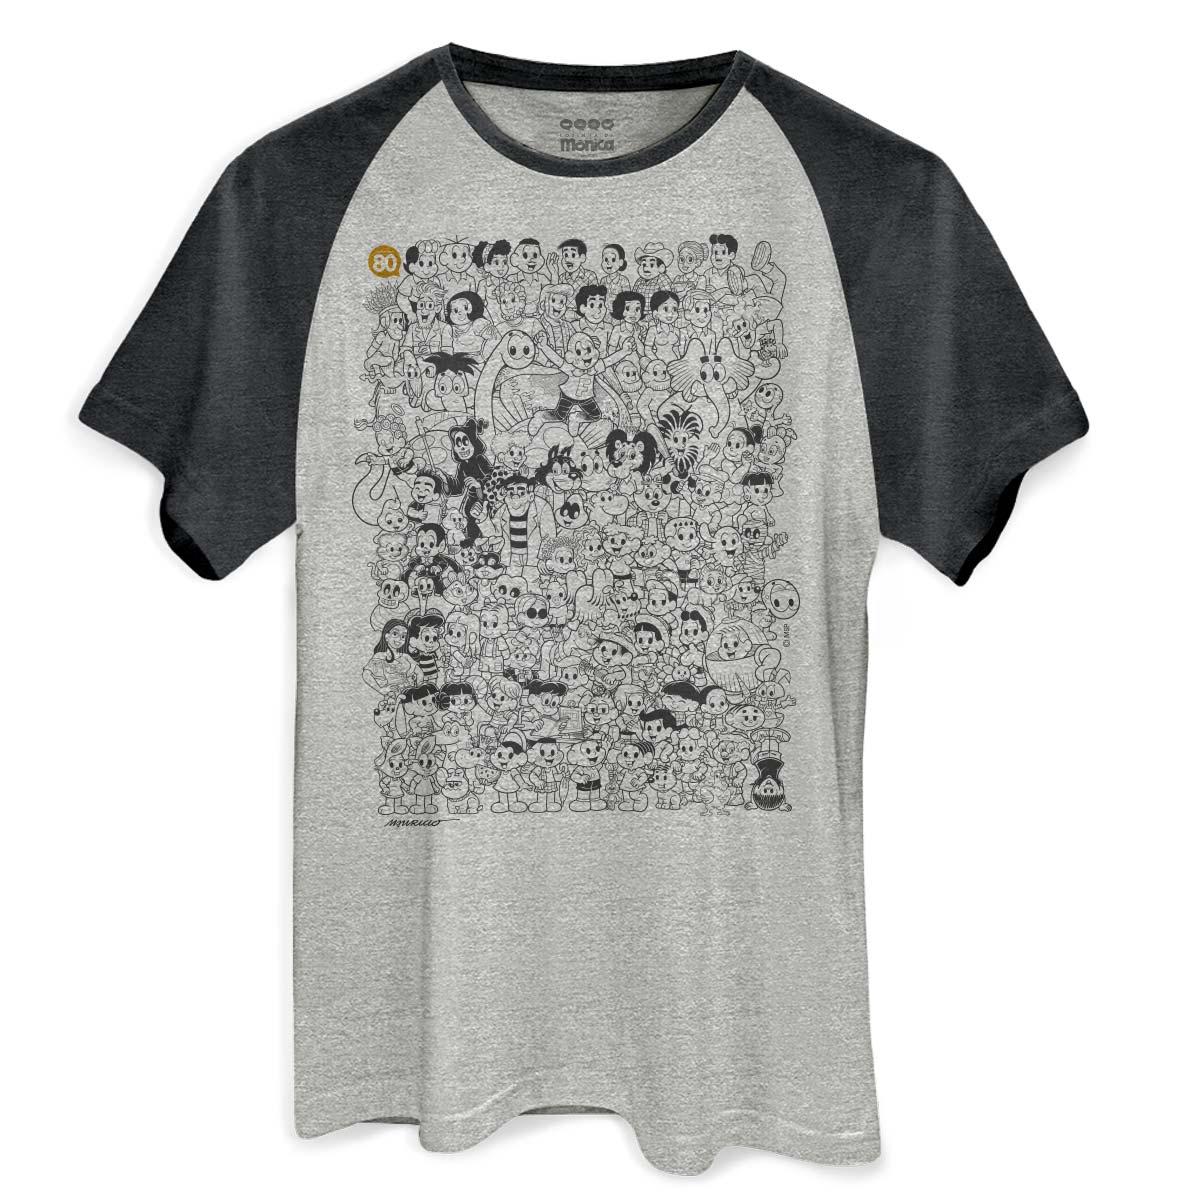 Camiseta Raglan Premium Masculina Maur�cio de Sousa 80 Anos P&B